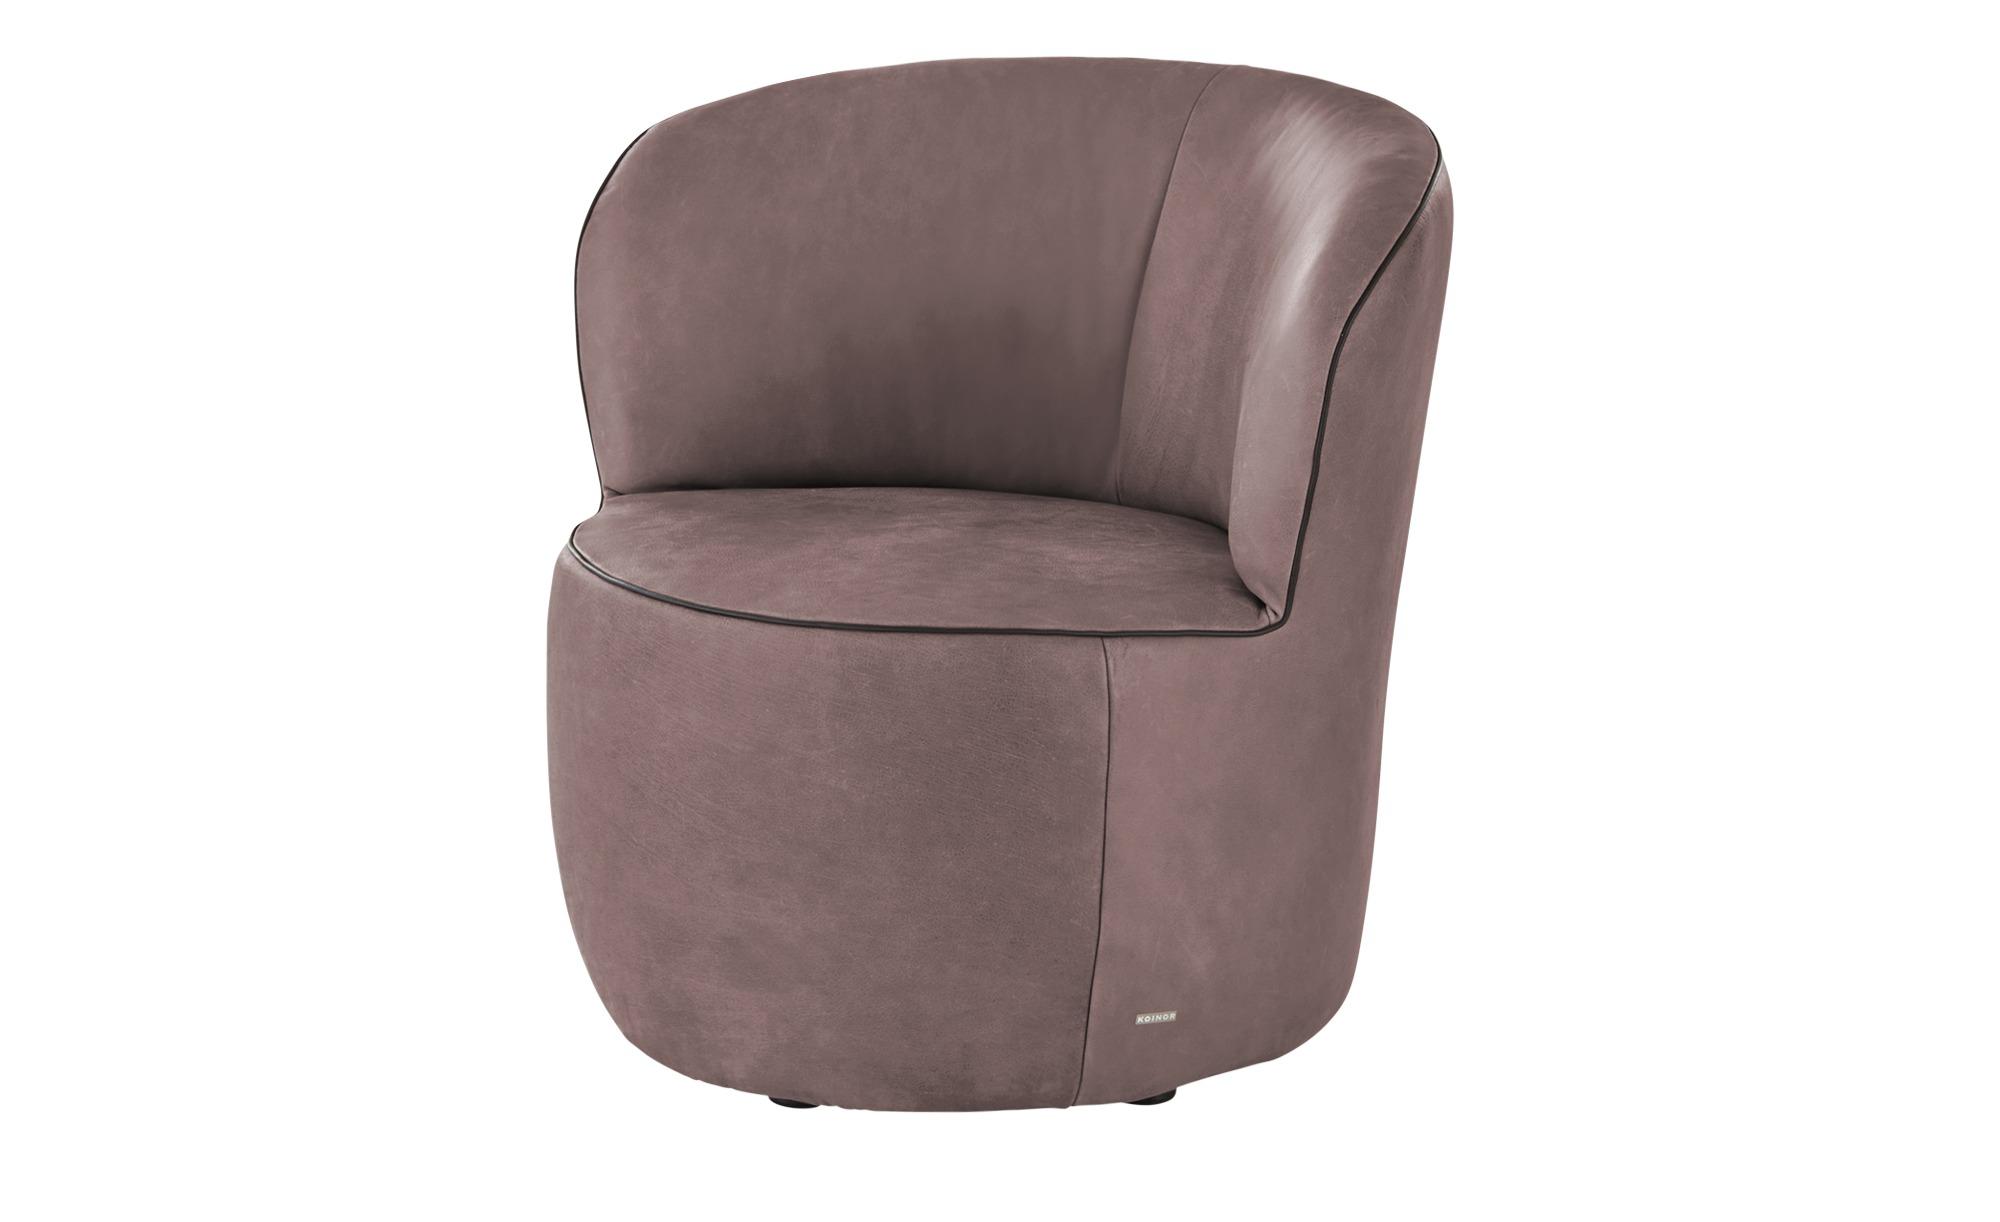 KOINOR Sessel  Igor ¦ rosa/pink ¦ Maße (cm): B: 73 H: 70 T: 72 Polstermöbel > Sessel > Ledersessel - Höffner